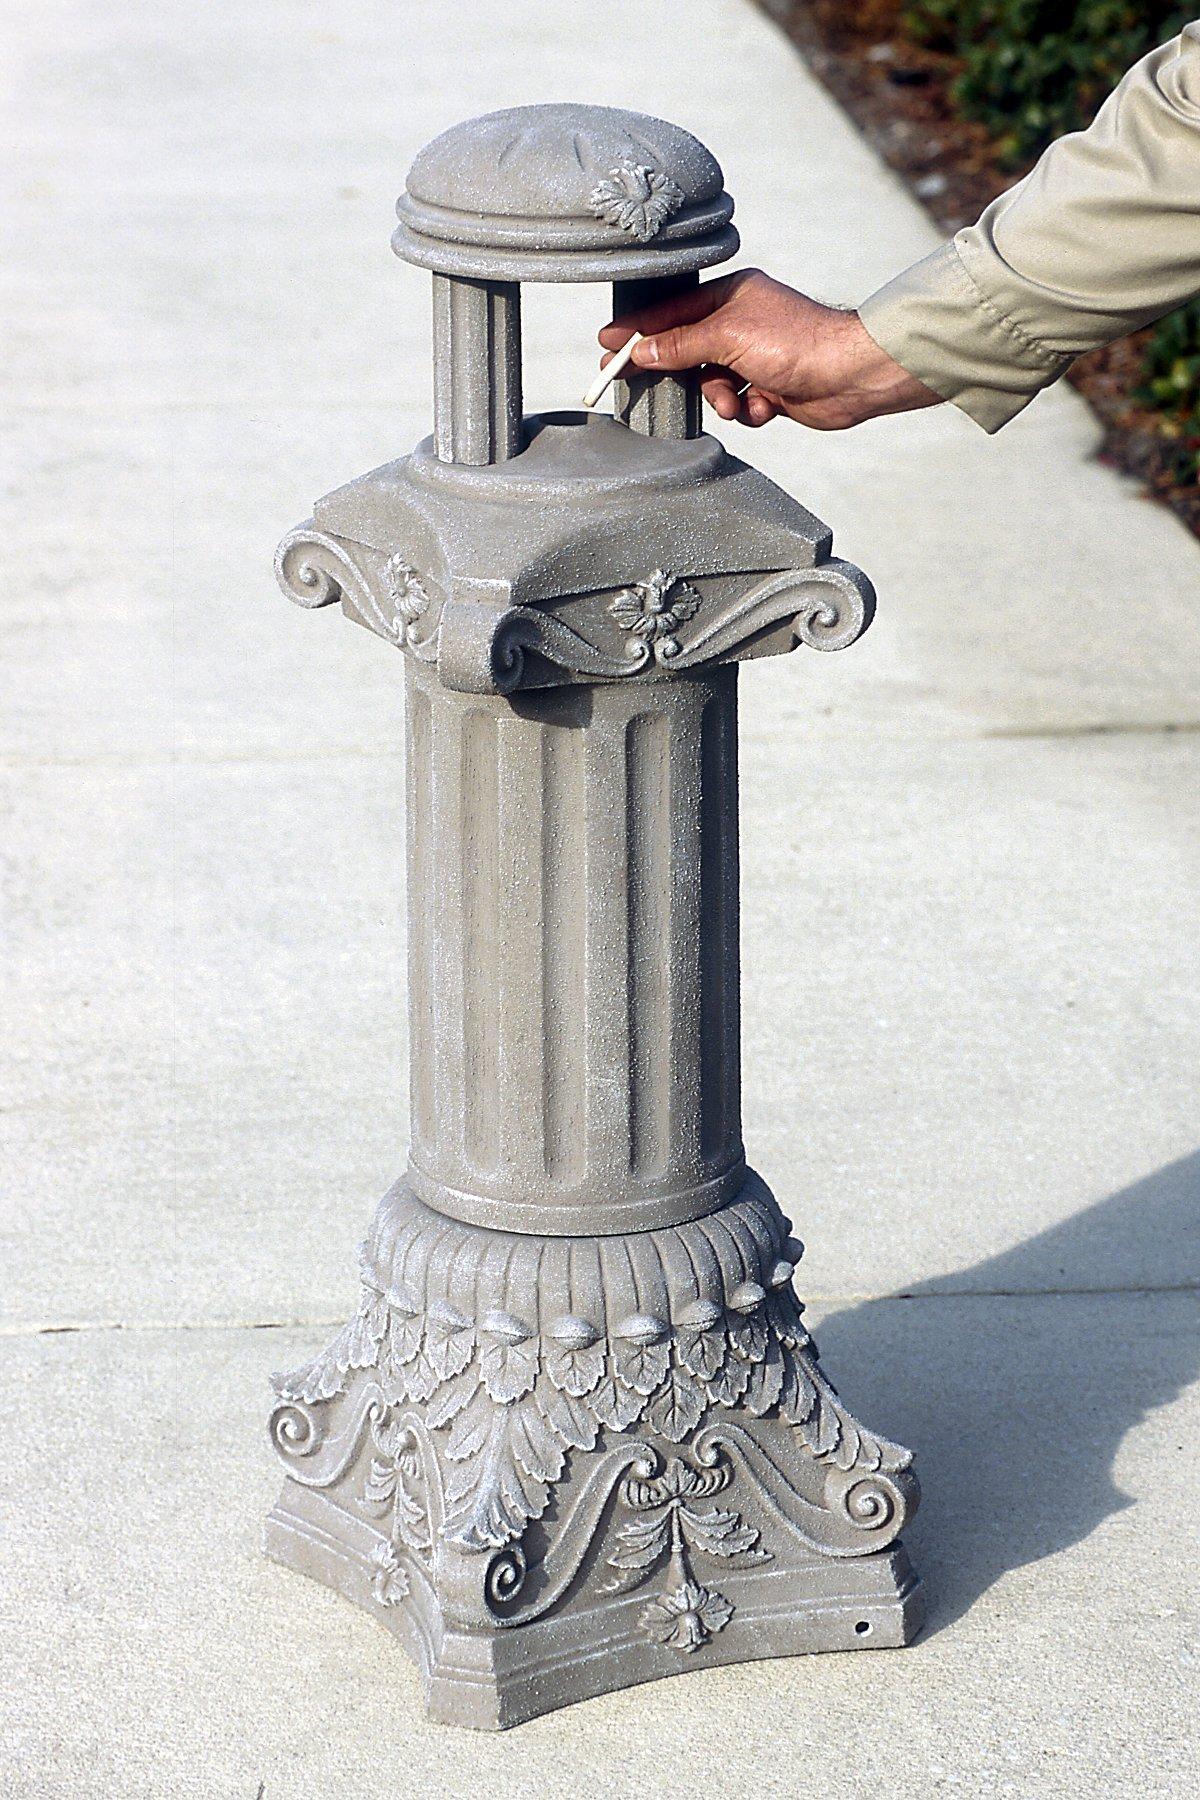 UltraTech 1554 Fiberglass Roman Column Ultra-Smoke Stop Receptacle, 13-1/2'' Length x 13-1/2'' Width x 38-1/2'' Height